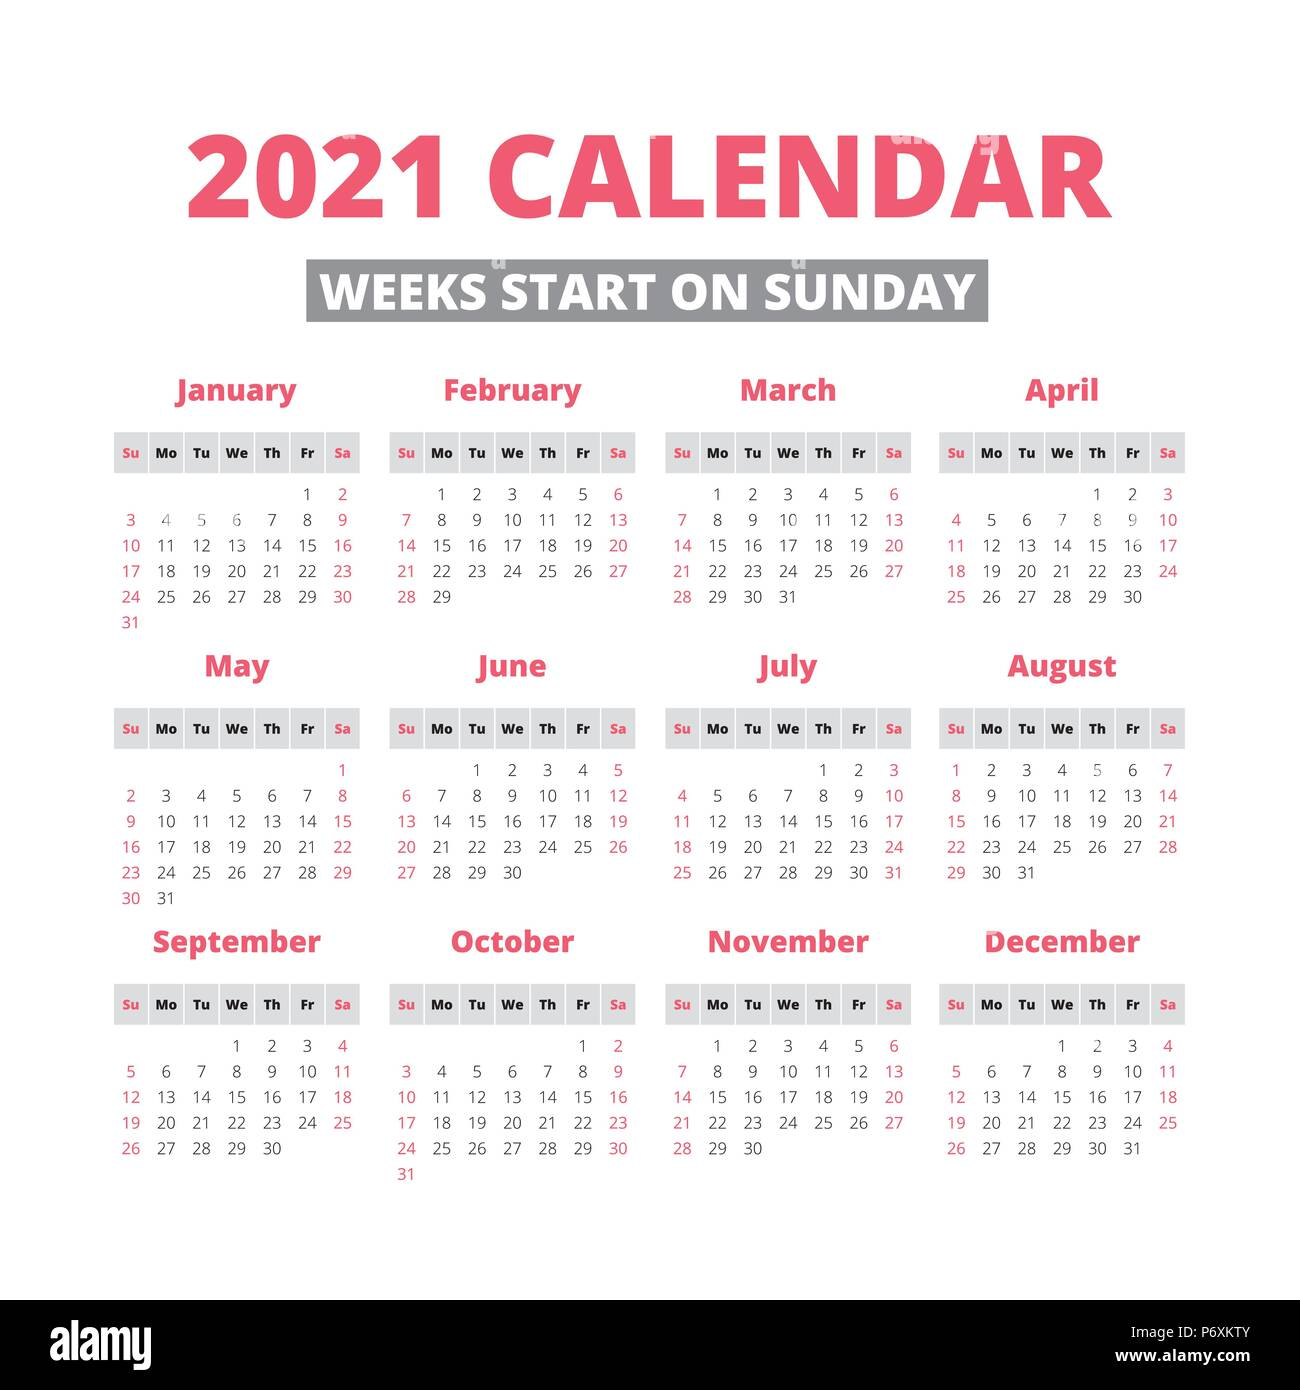 Photos of 2021 Calendar Sundays